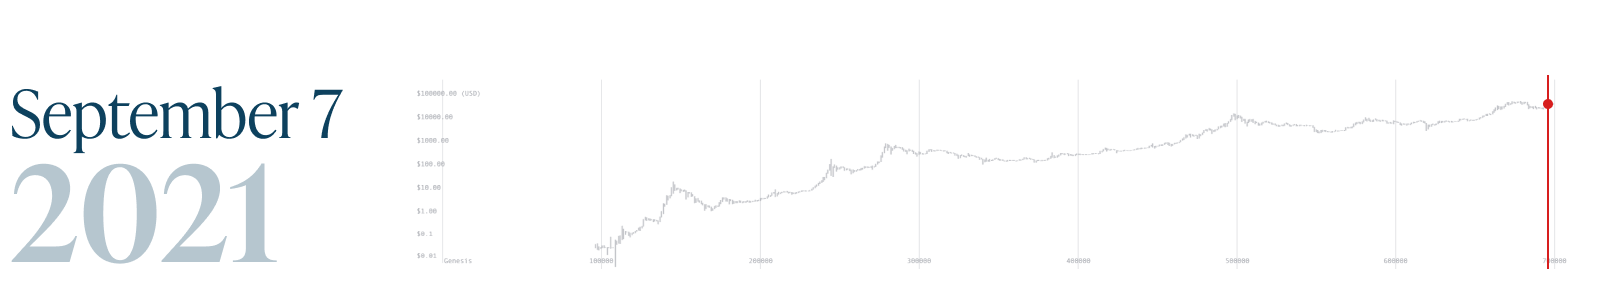 Monochrome_Bitcoin Block 700k_7 Sep 2021.png